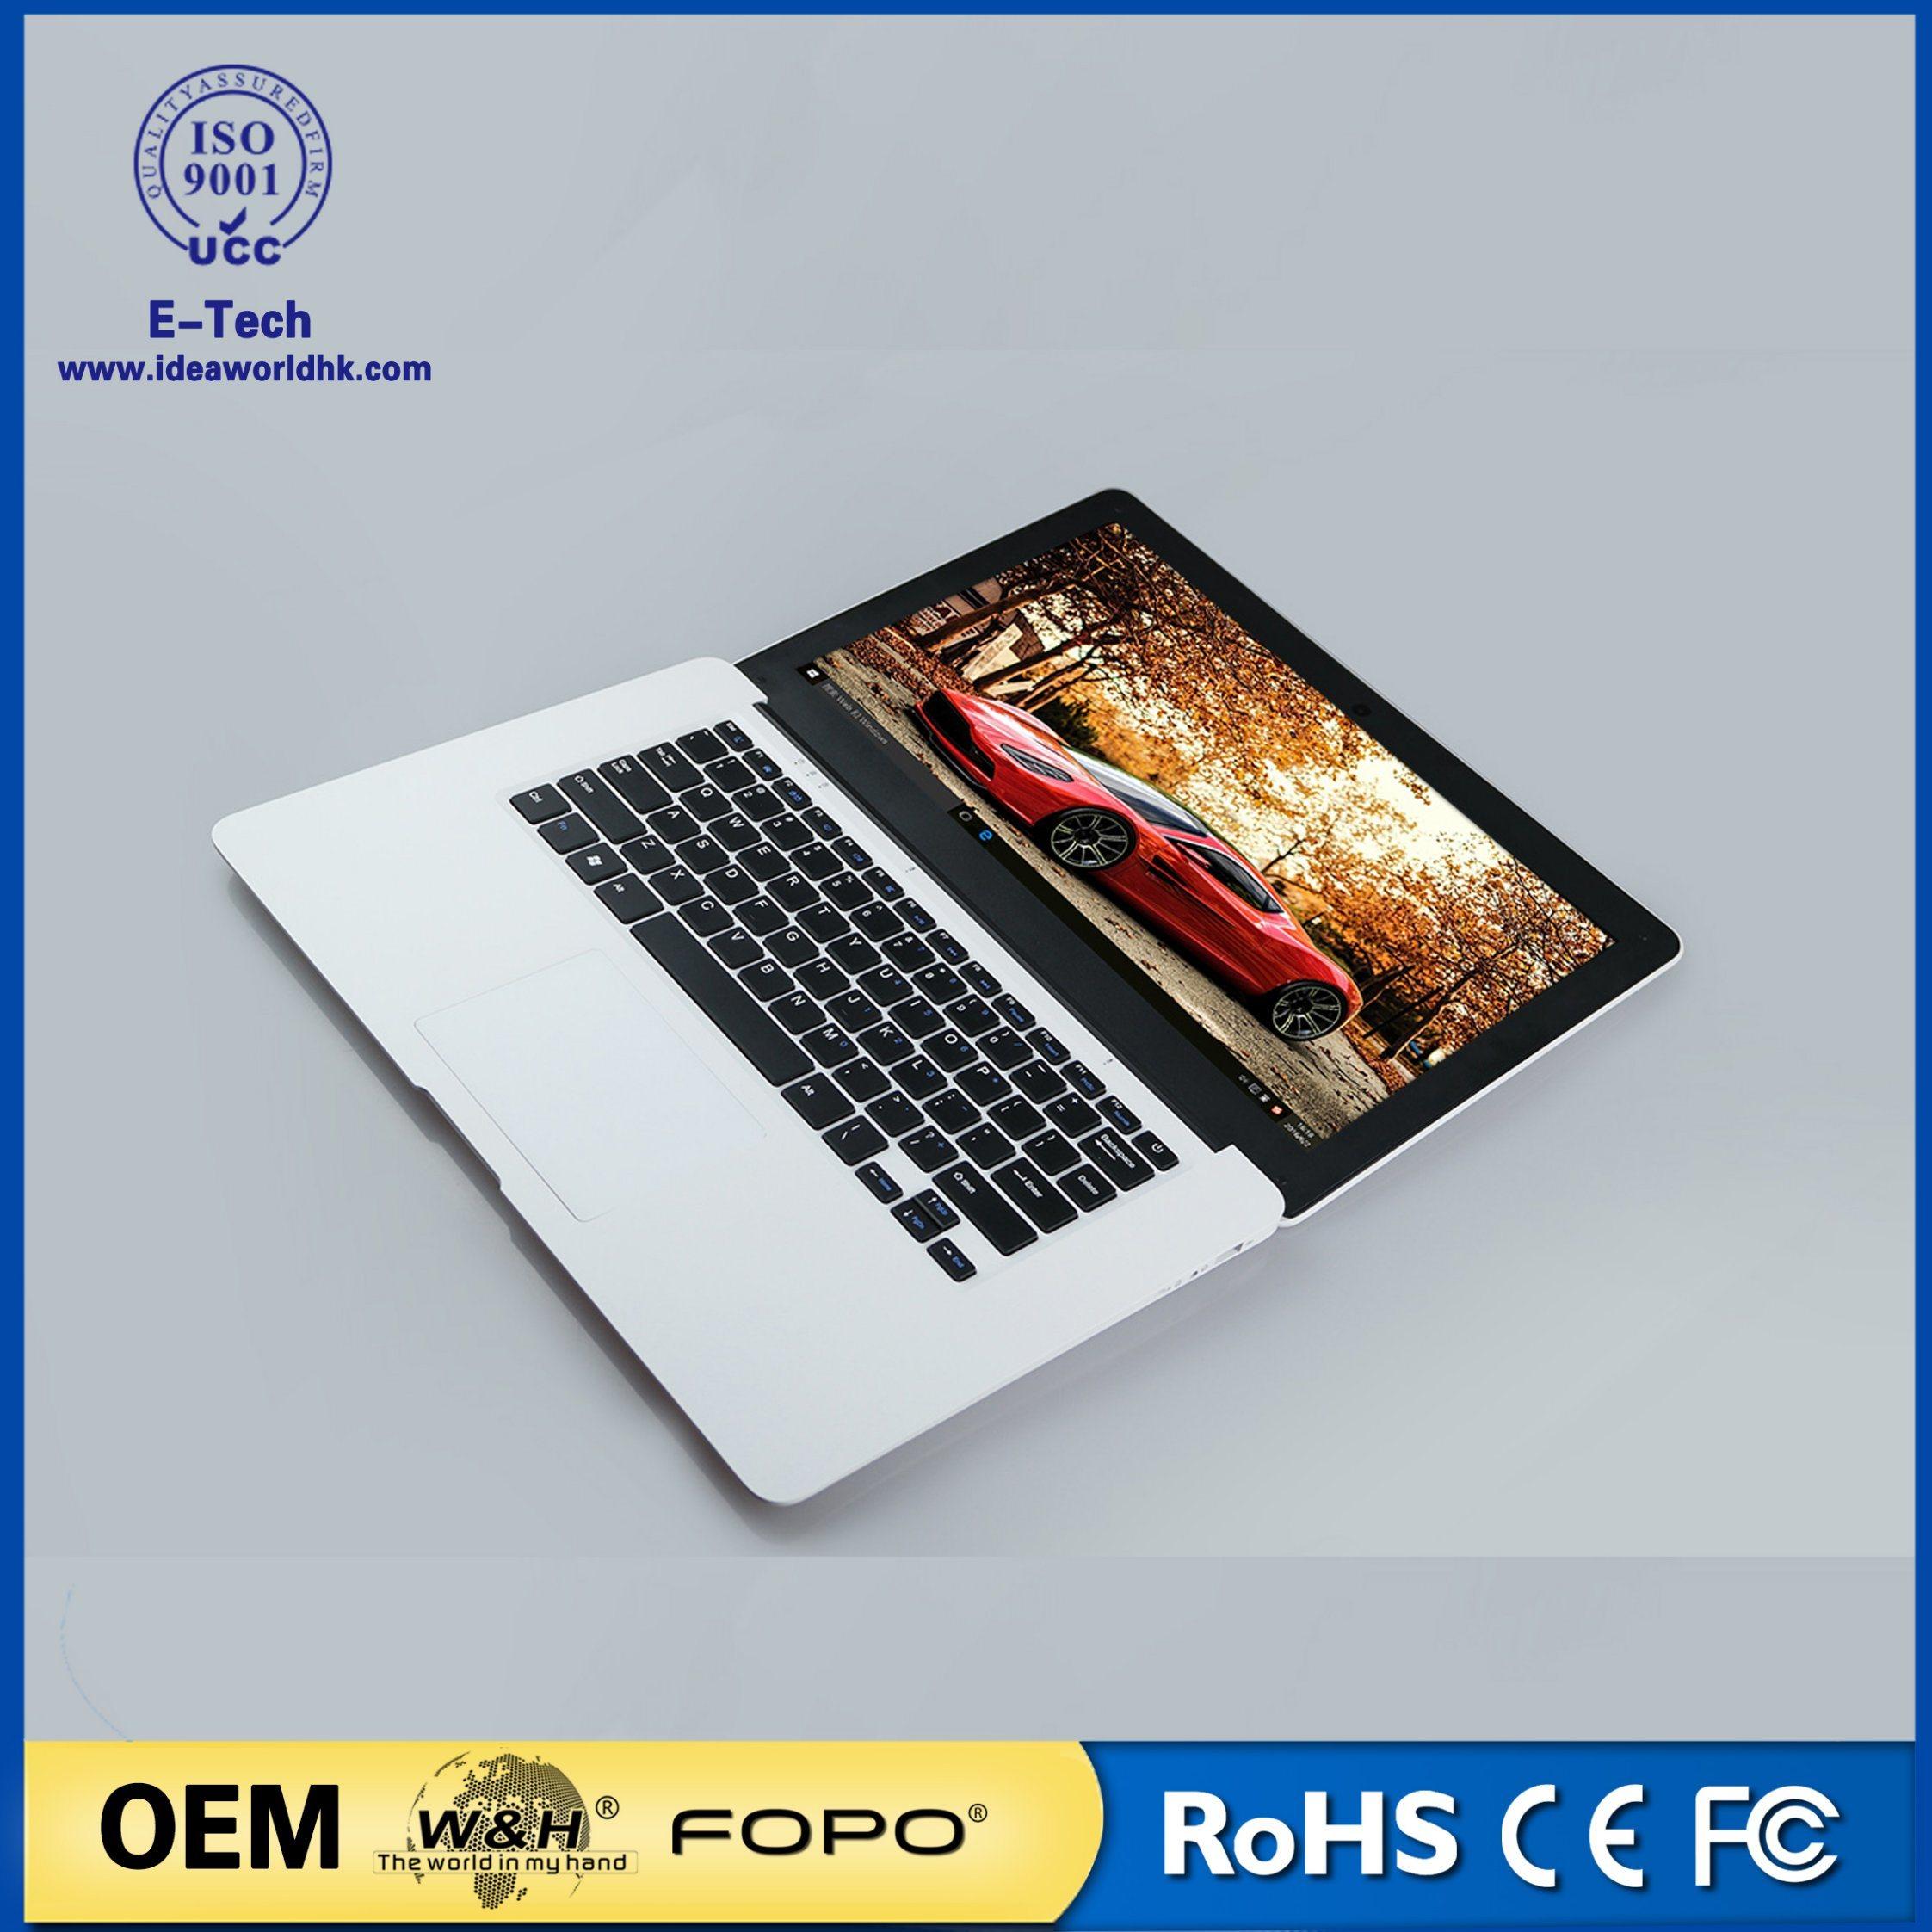 14.1 Inch Quad Core Laptop Notebook PC